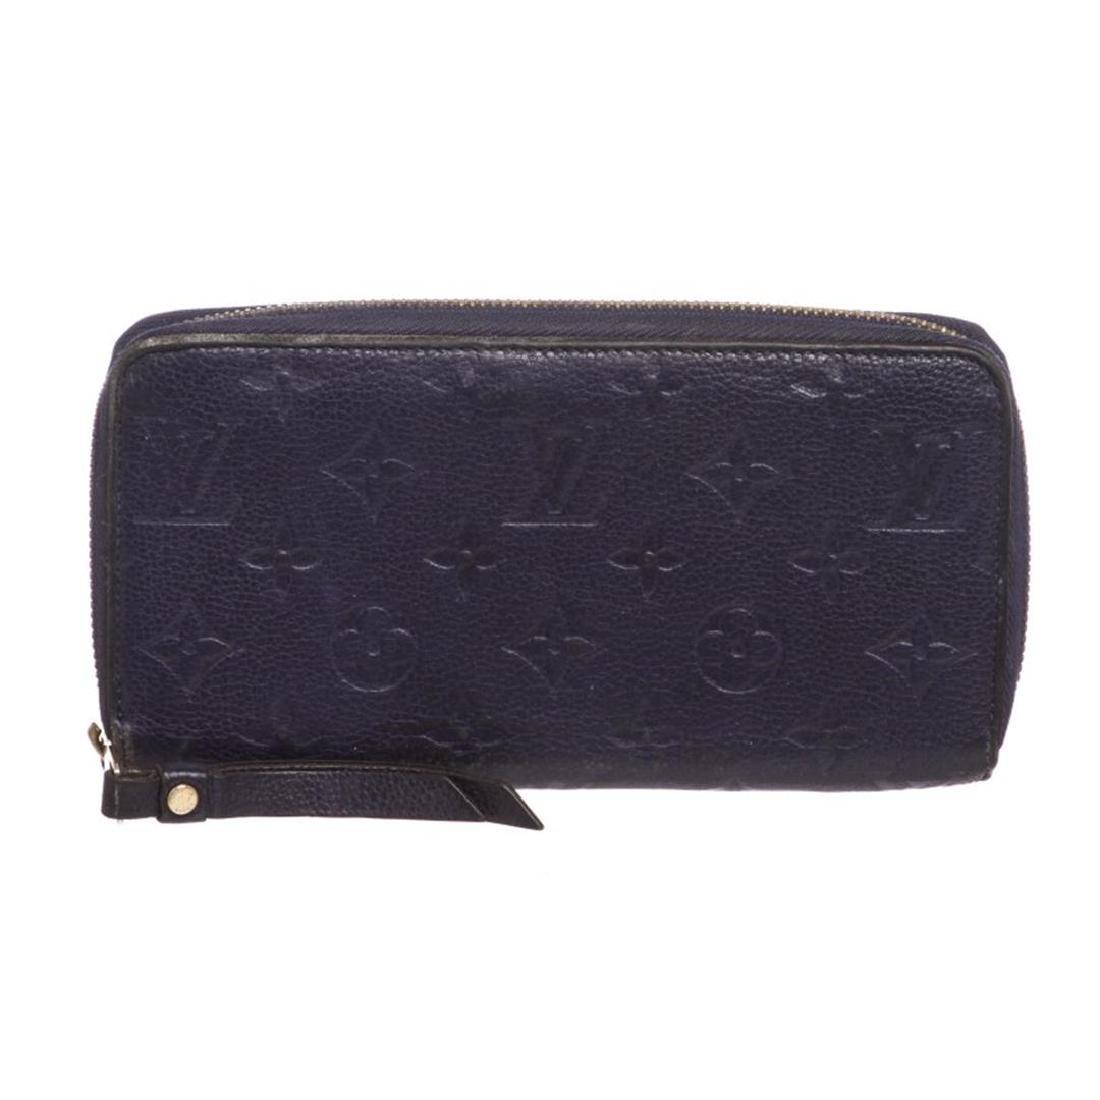 Louis Vuitton Blue Empreinte Leather Monogram Zippy